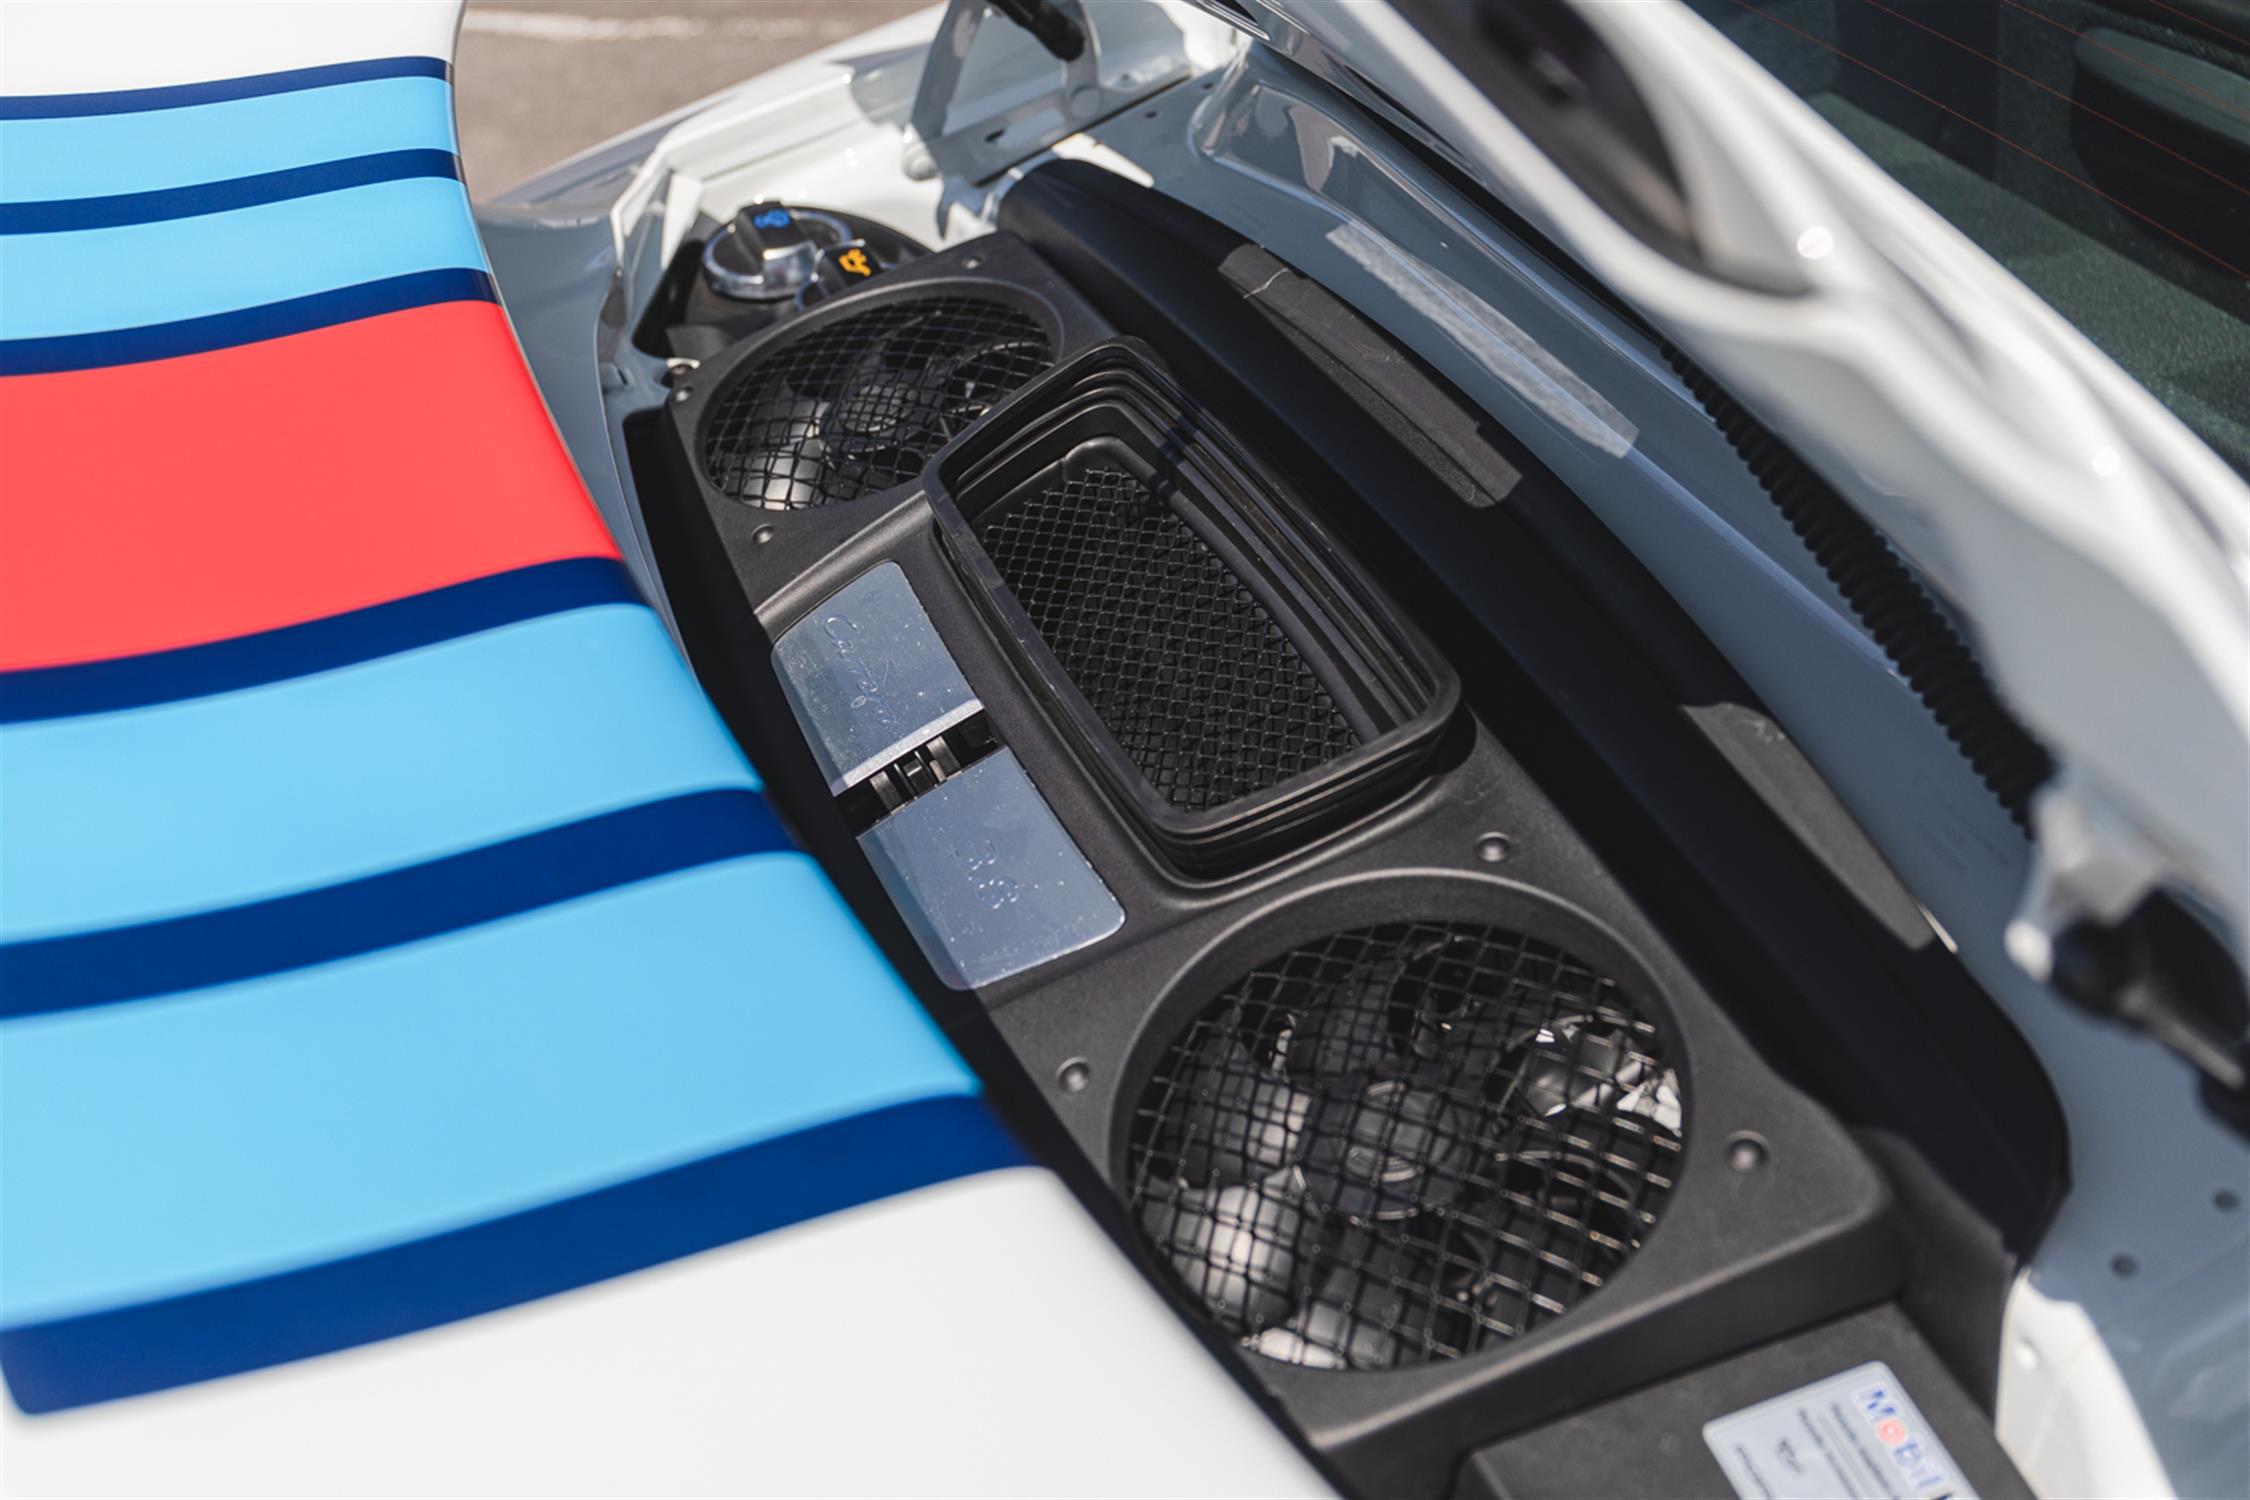 2014 Porsche 911 (991) 3.8 Martini Racing Edition (RHD) - Image 10 of 10